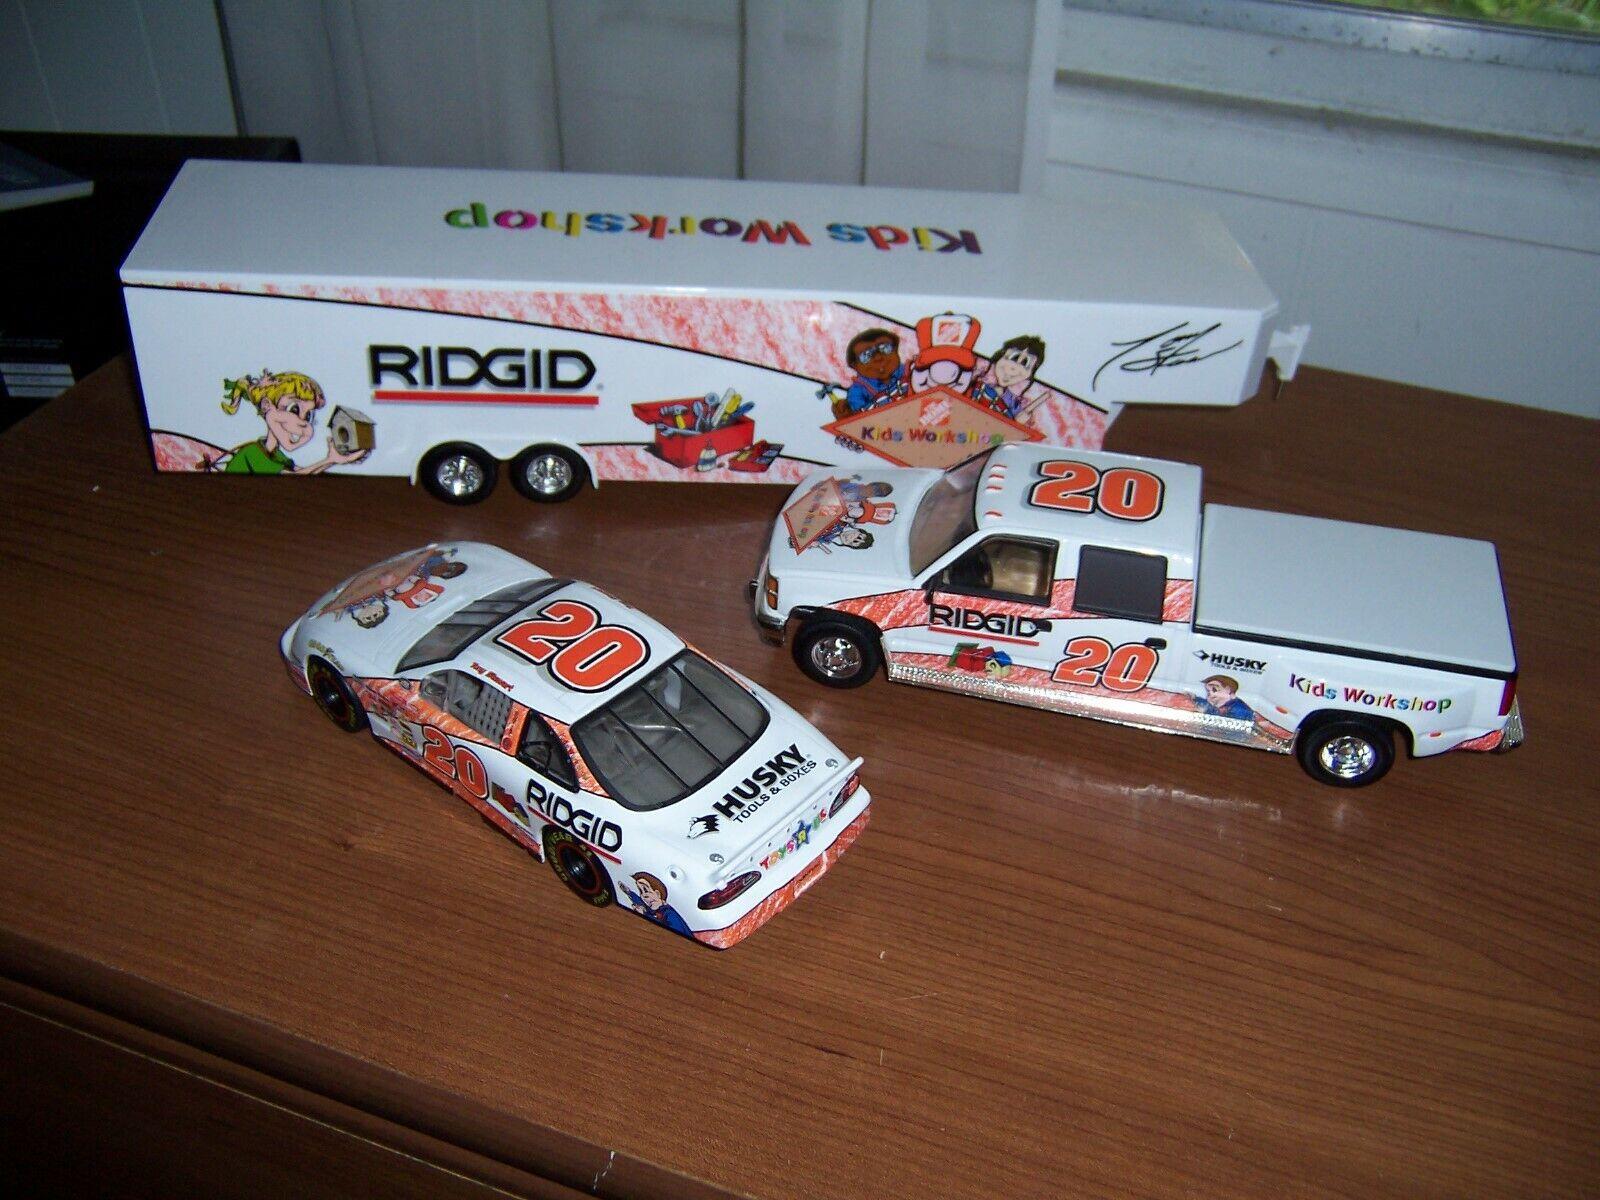 1999 Tony Stewart Rookie Home Depot Kids Workshop Brookfield Collection